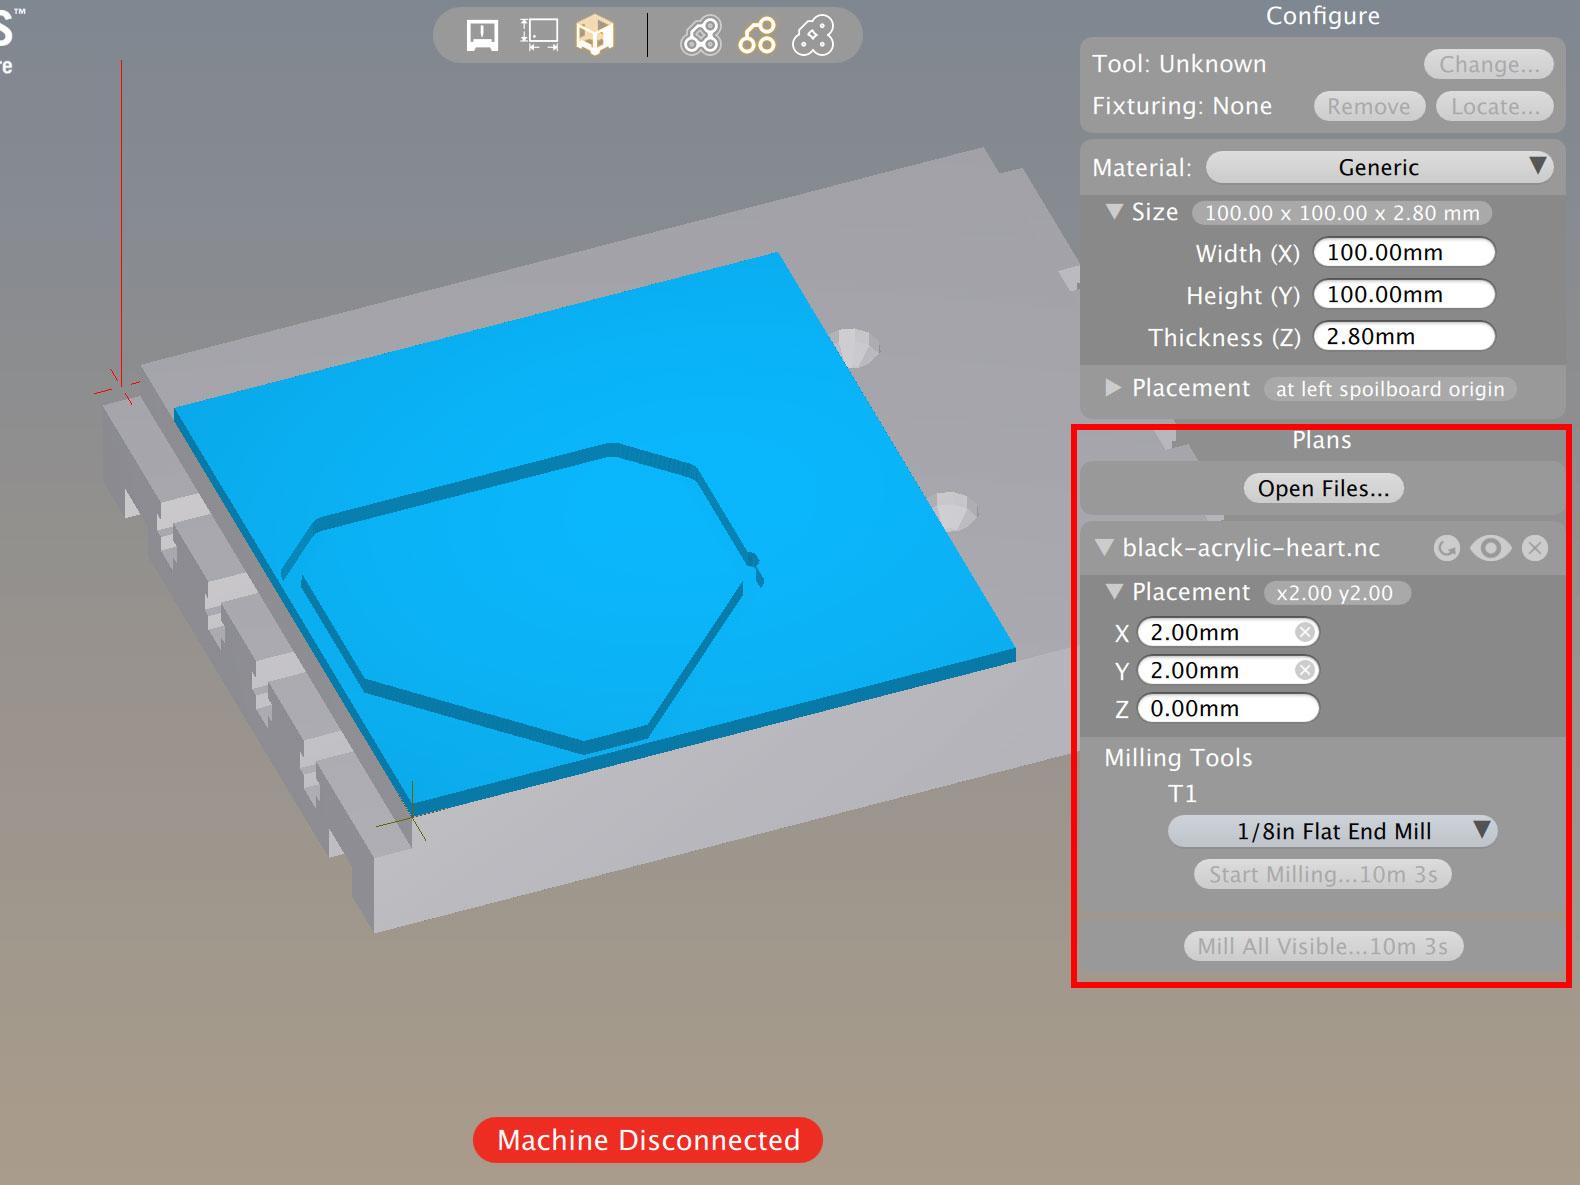 3d_printing_bt-plan-setup.jpg